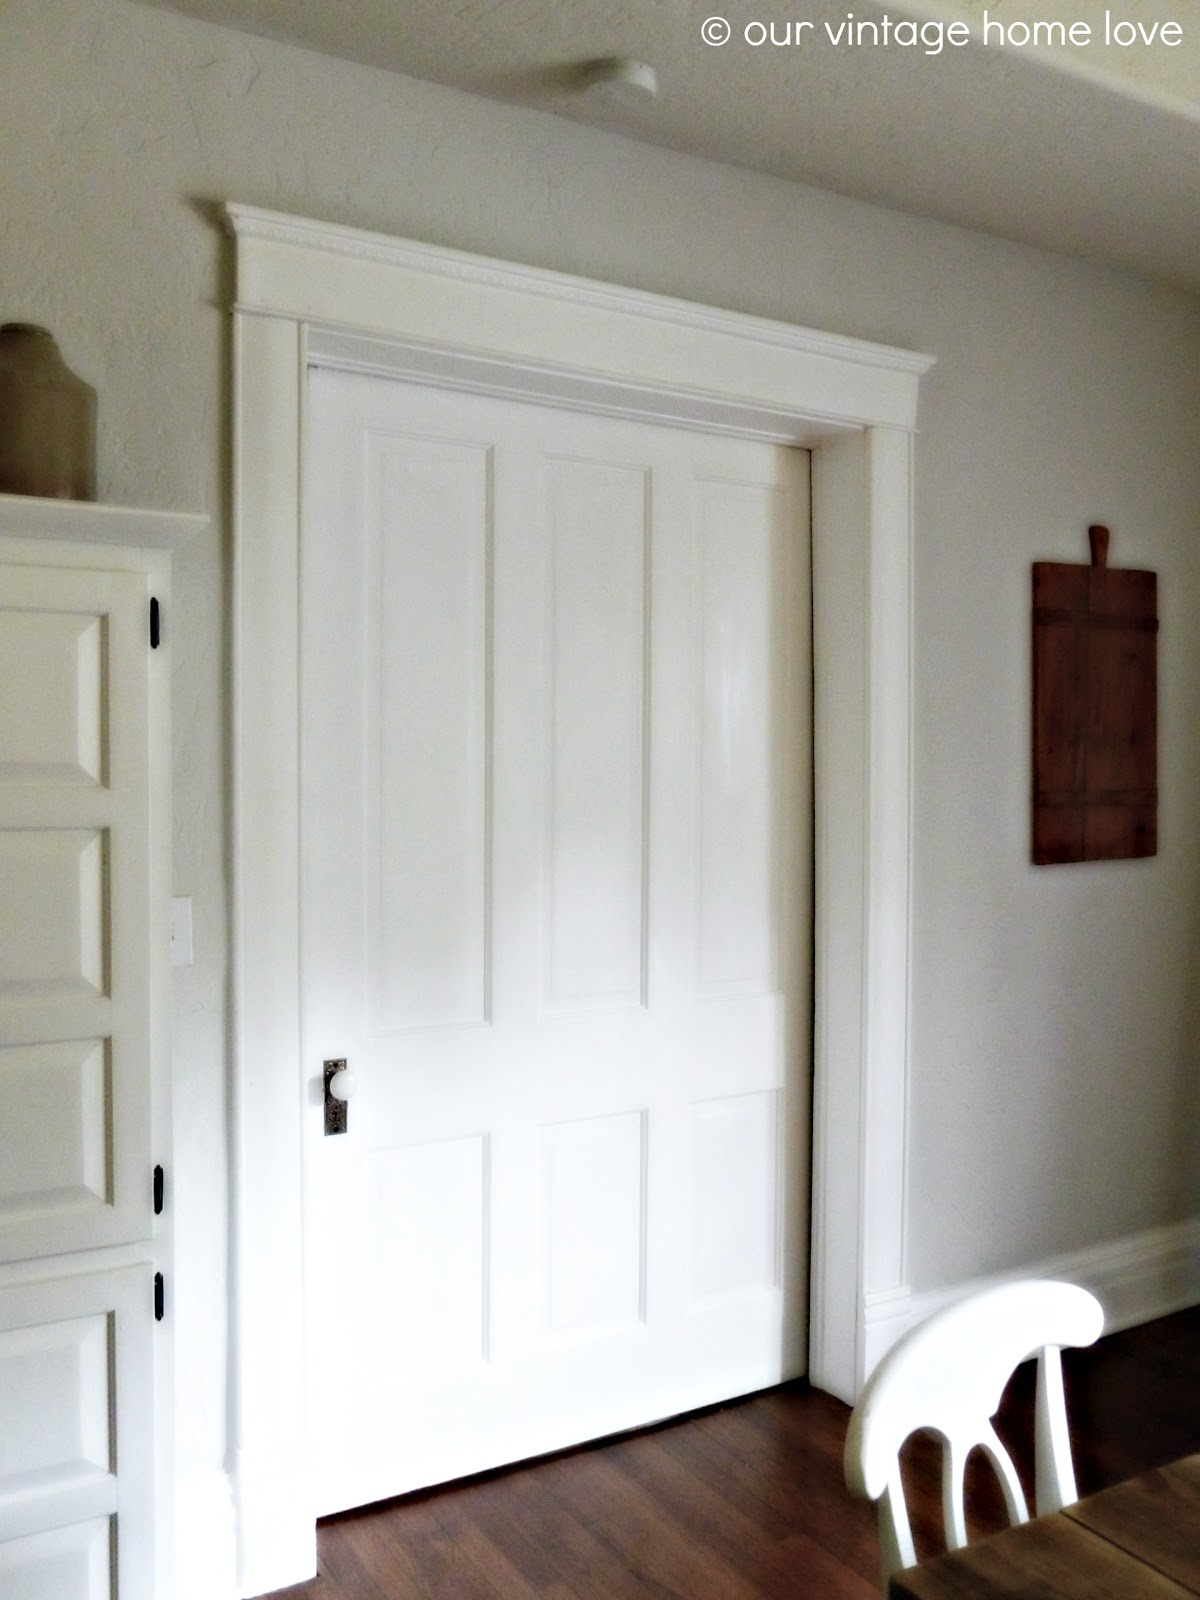 Vintage Home Love Pocket Doors And Porcelain Door Knobs